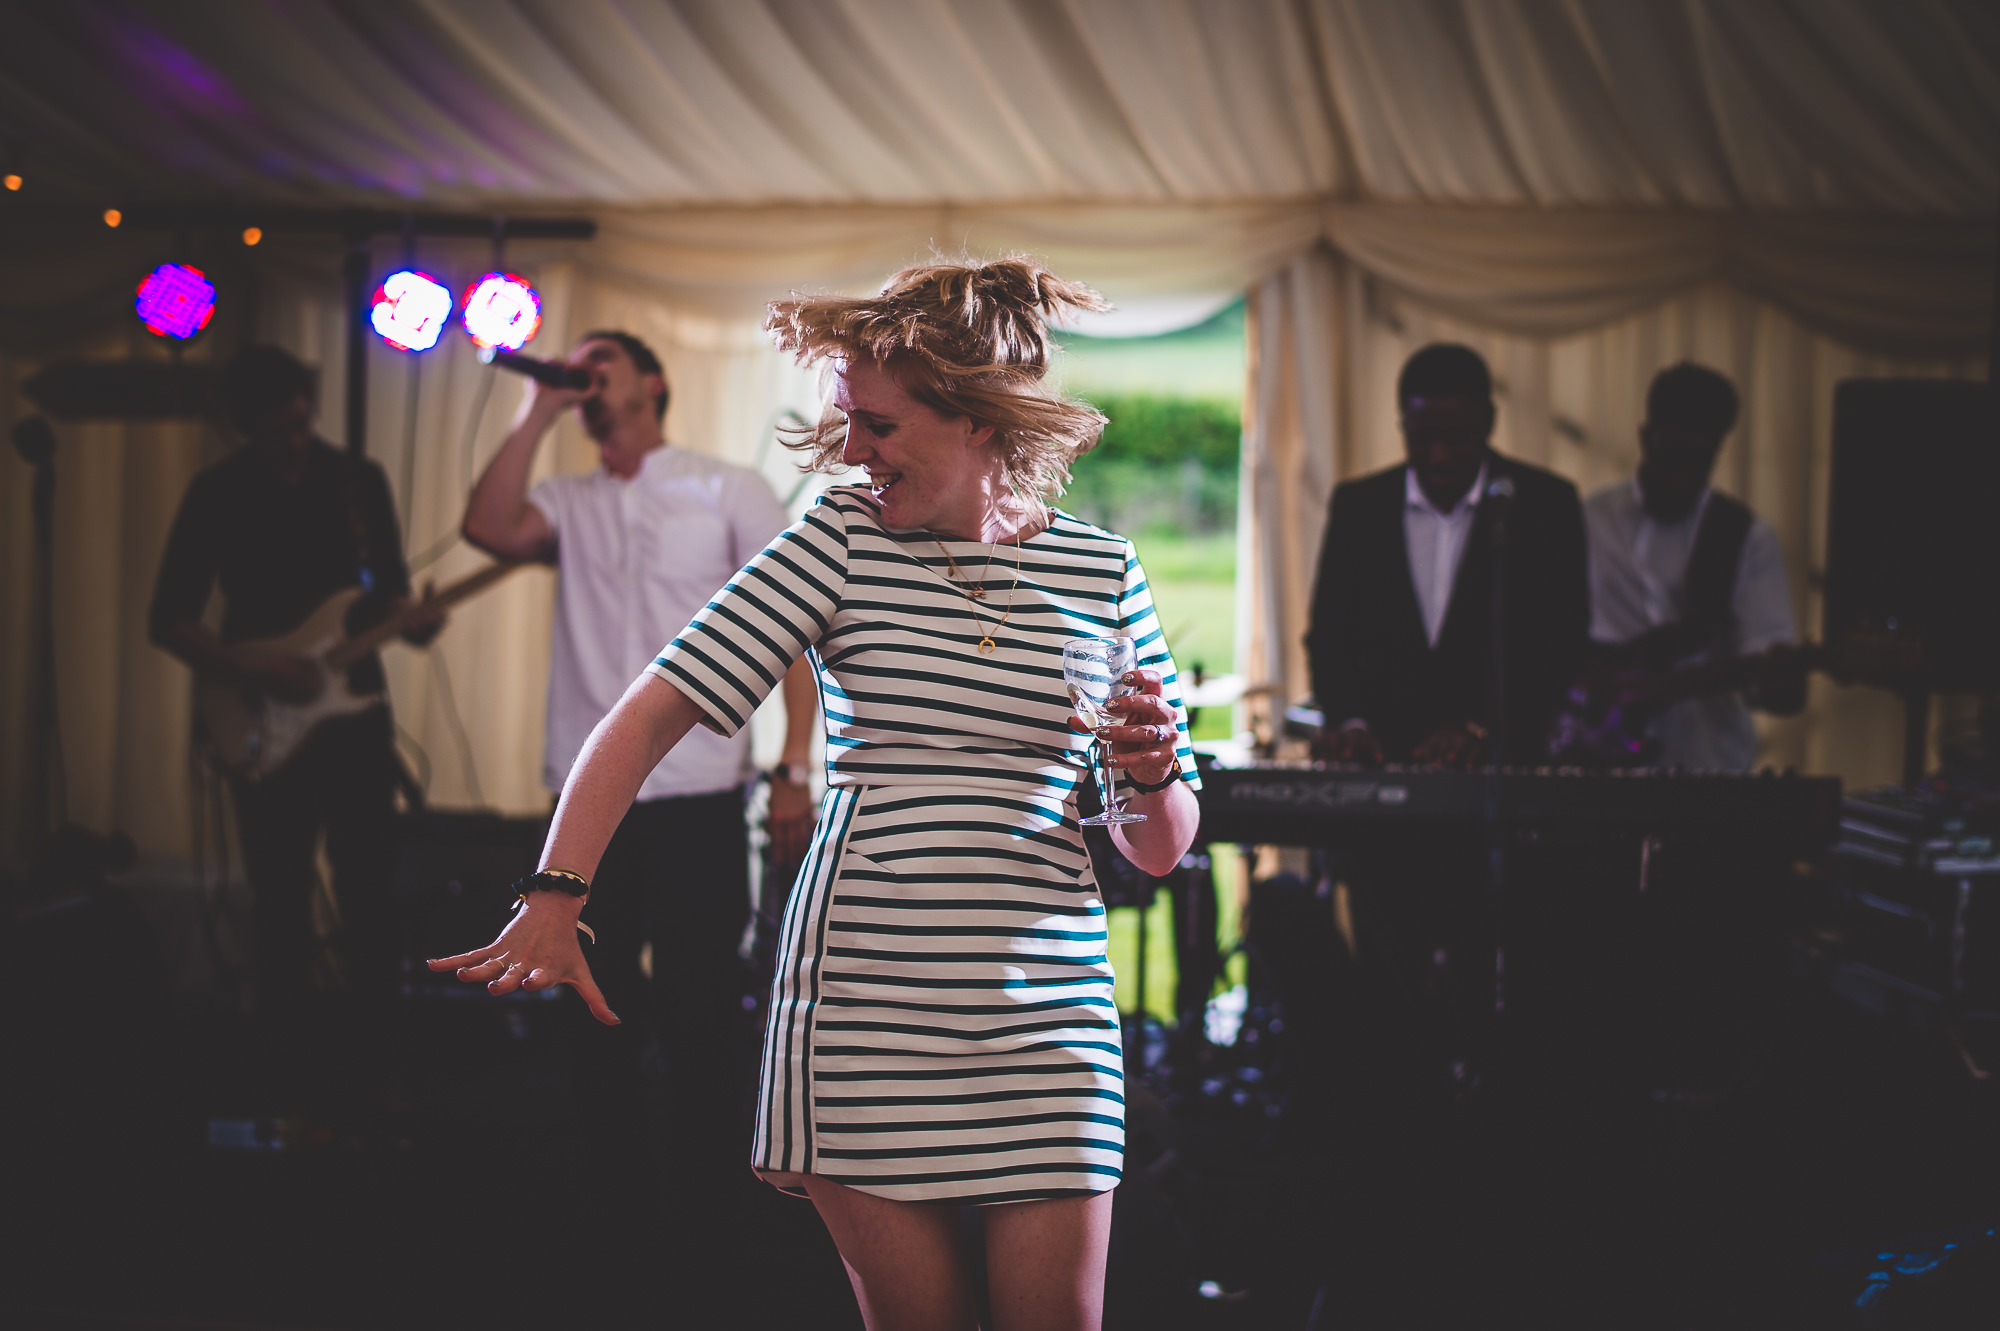 Veils & Bales Wedding Photography | Charlie & Steve SCSS 308